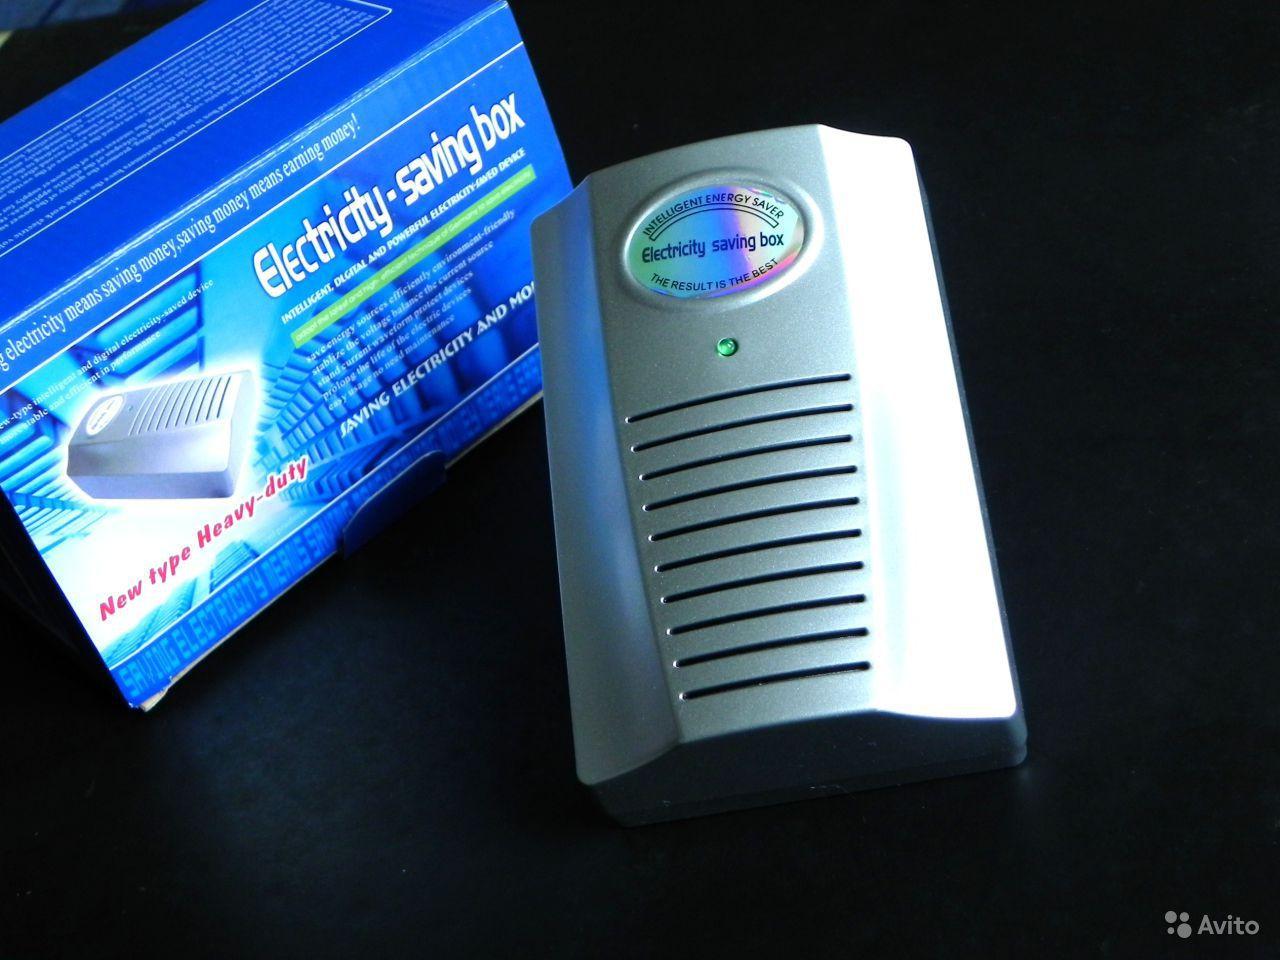 Энергосберегающий прибор Electricity - saving box NEW, цена 135 грн., купить в Одессе - Prom.ua (ID# 54918566)